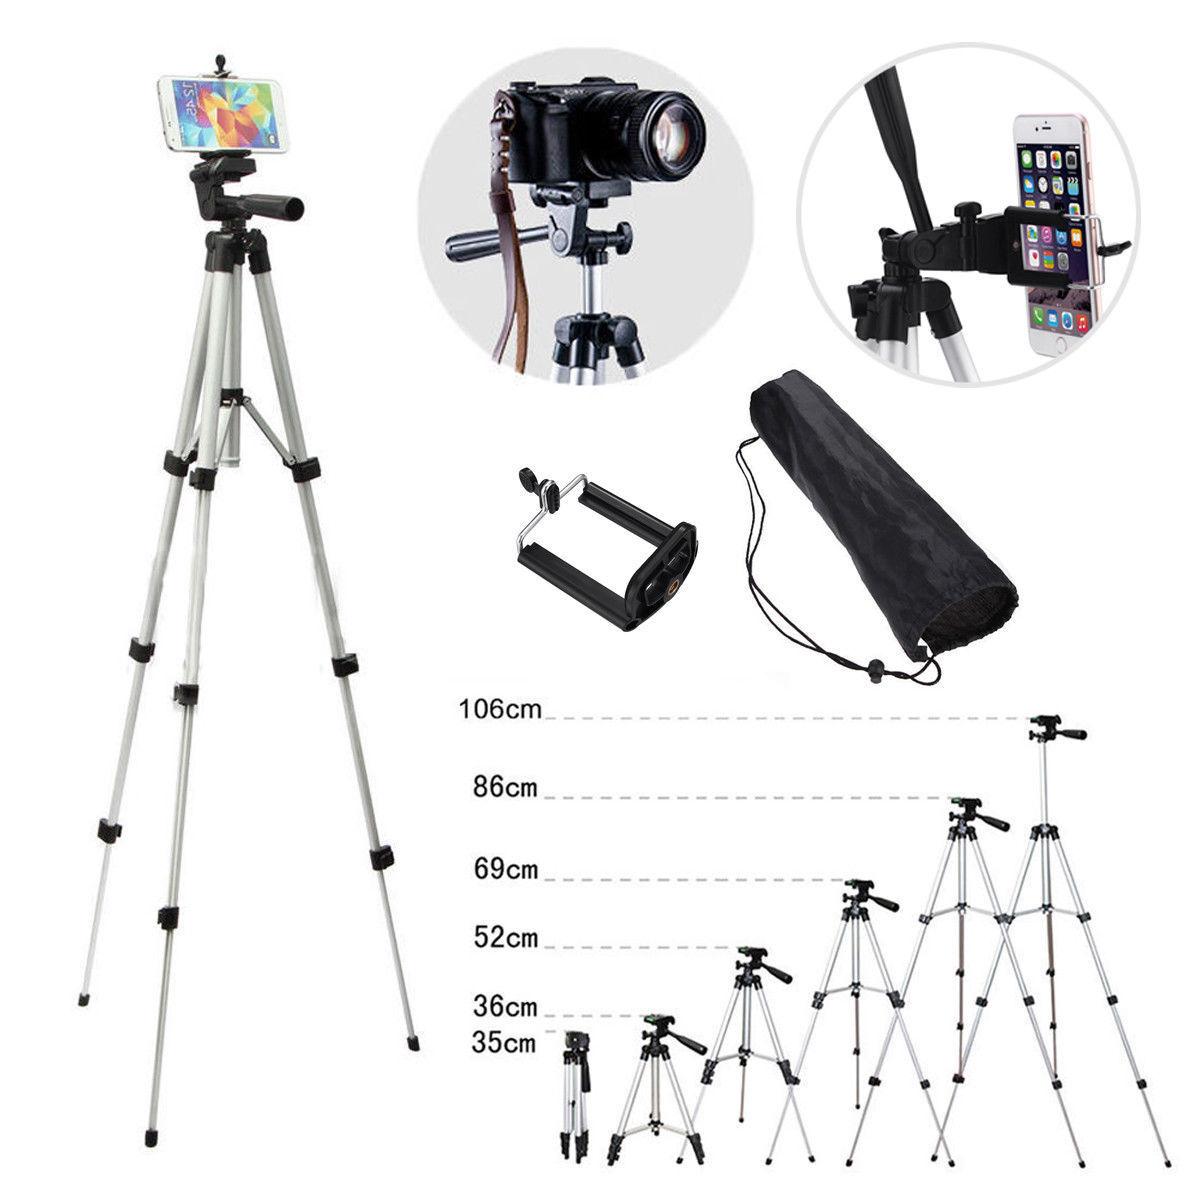 Купить Unbranded/Generic SW-3638 - Portable Professional Adjustable Camera Tripod Stand Cell Phone Mount Holder